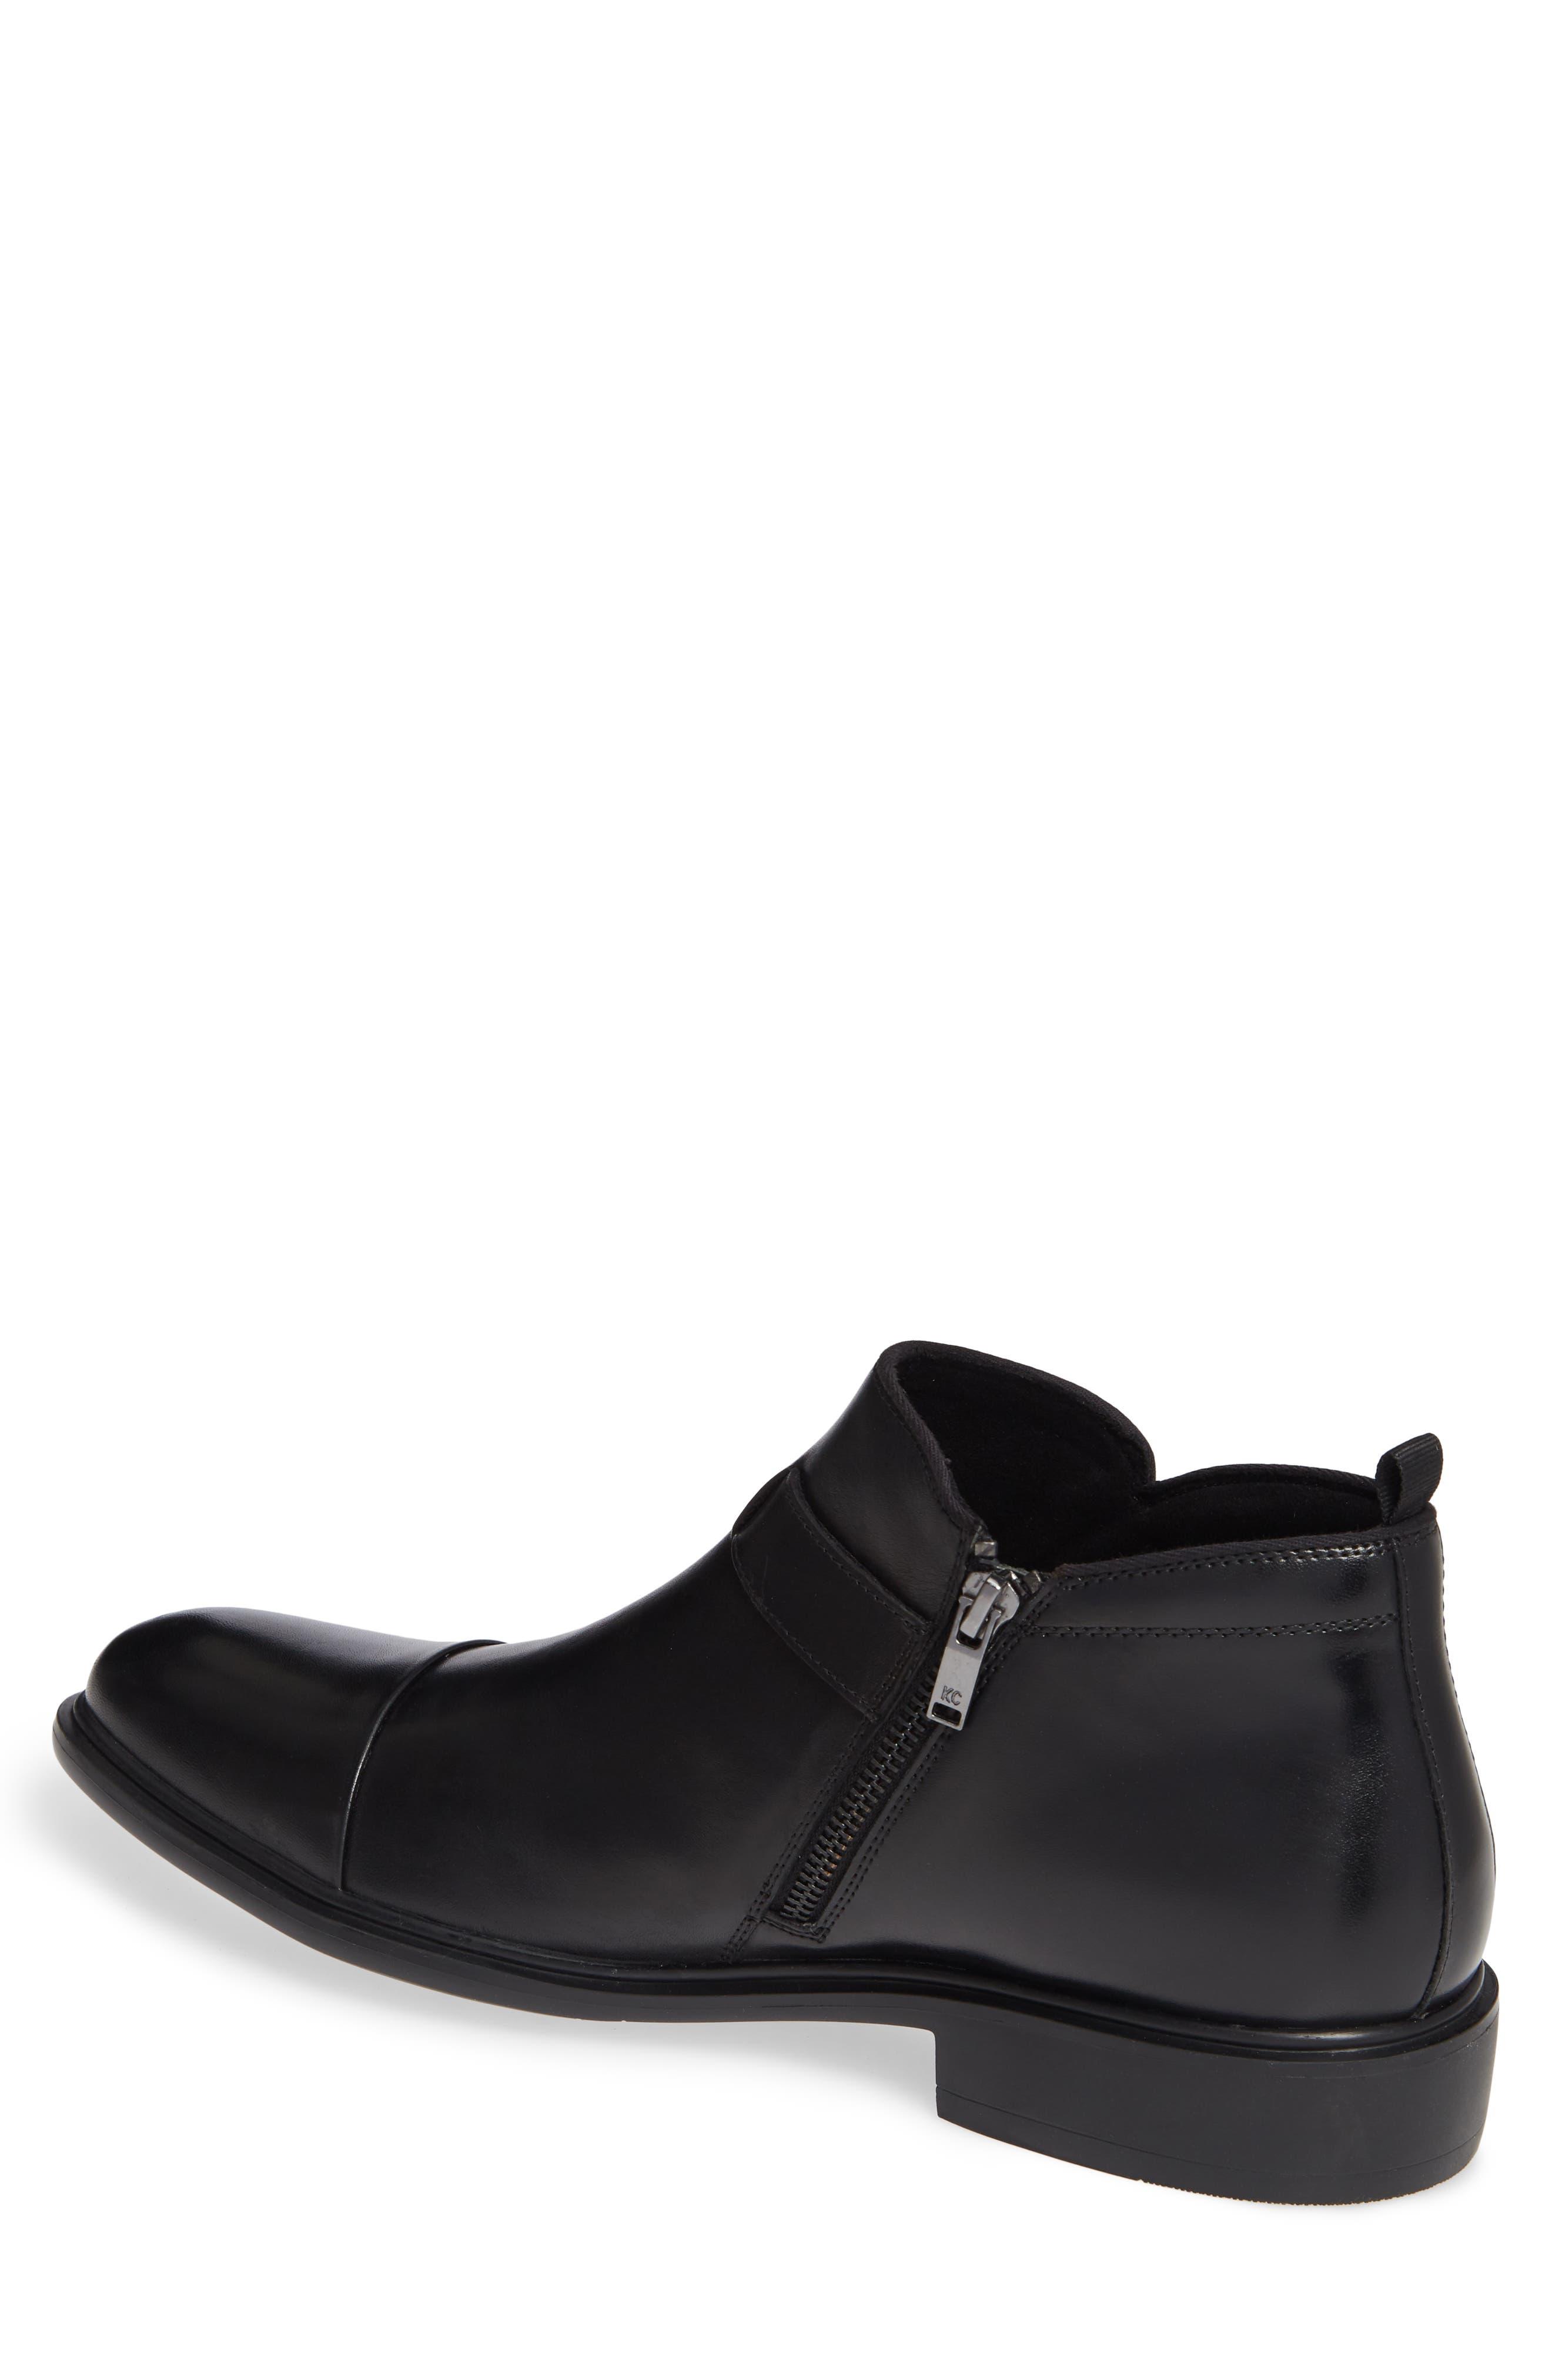 Garner Zip Boot,                             Alternate thumbnail 2, color,                             BLACK LEATHER